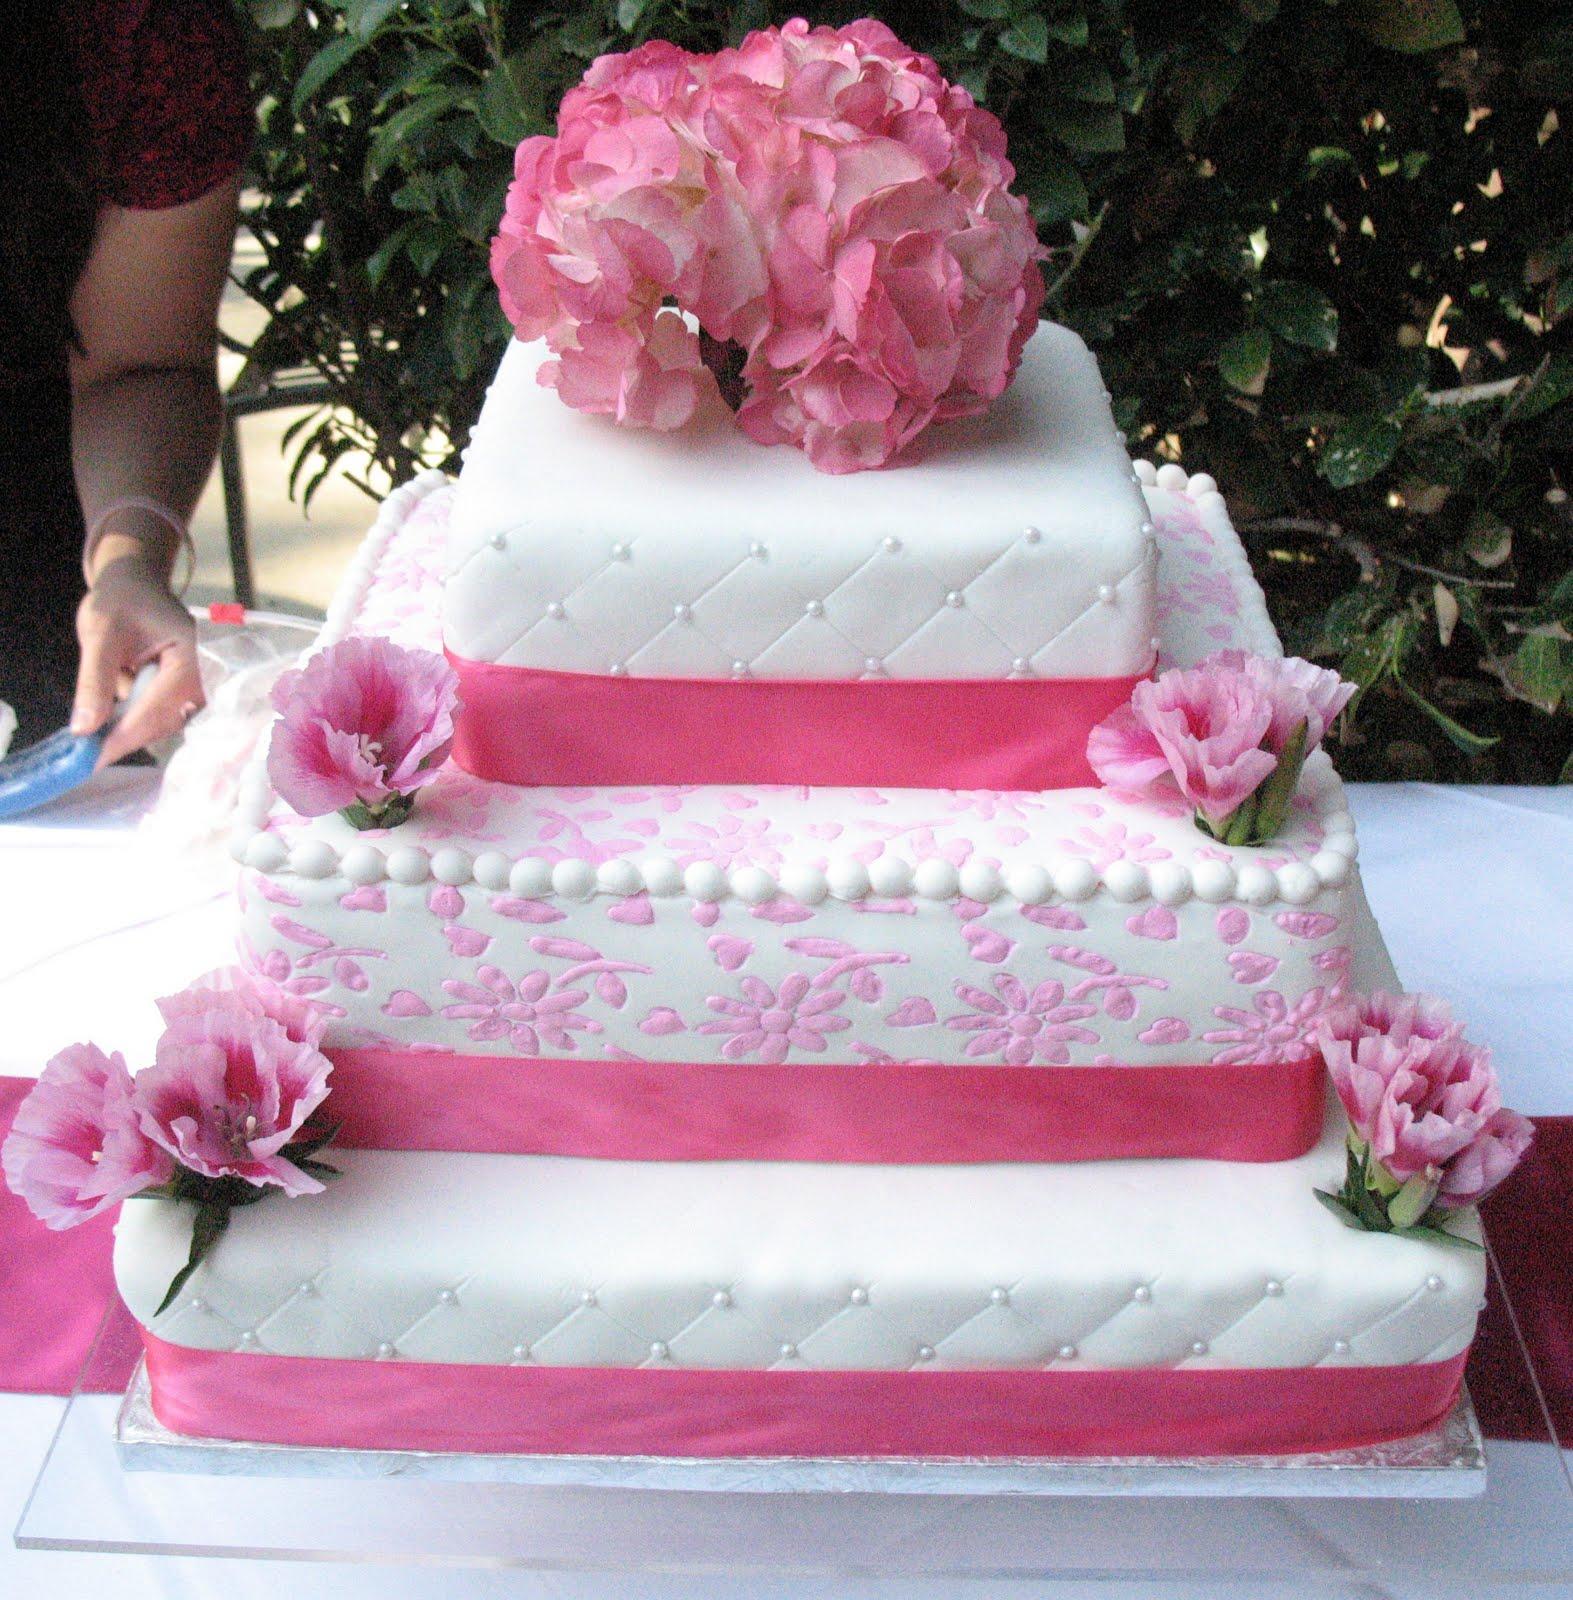 J s Cakes Pink Flowers Wedding Cake